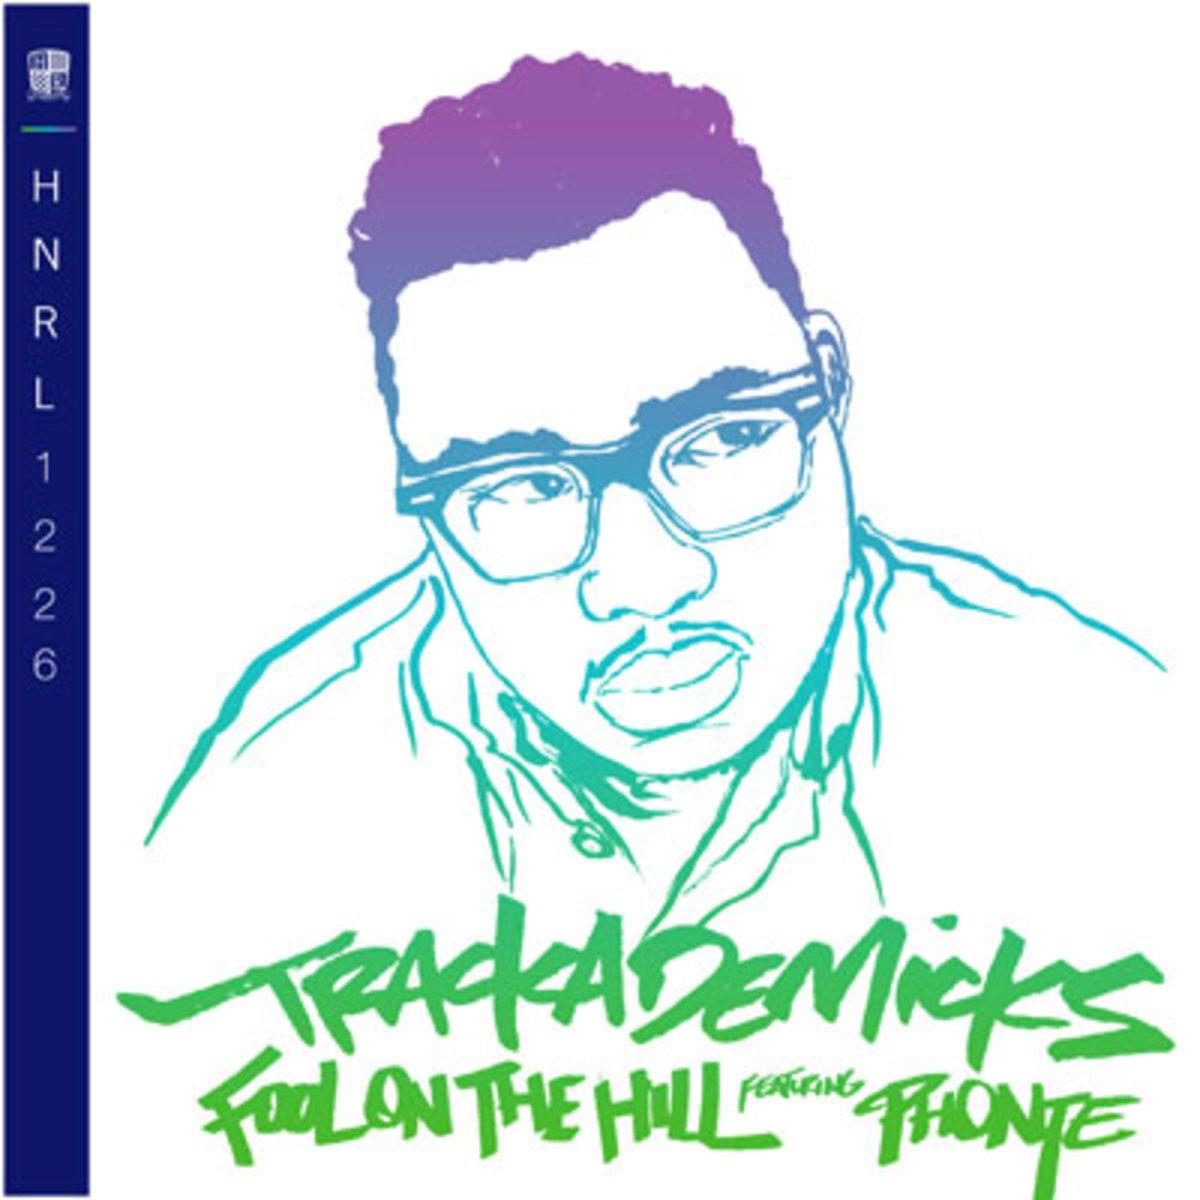 trackademicks-foolonthehill.jpg